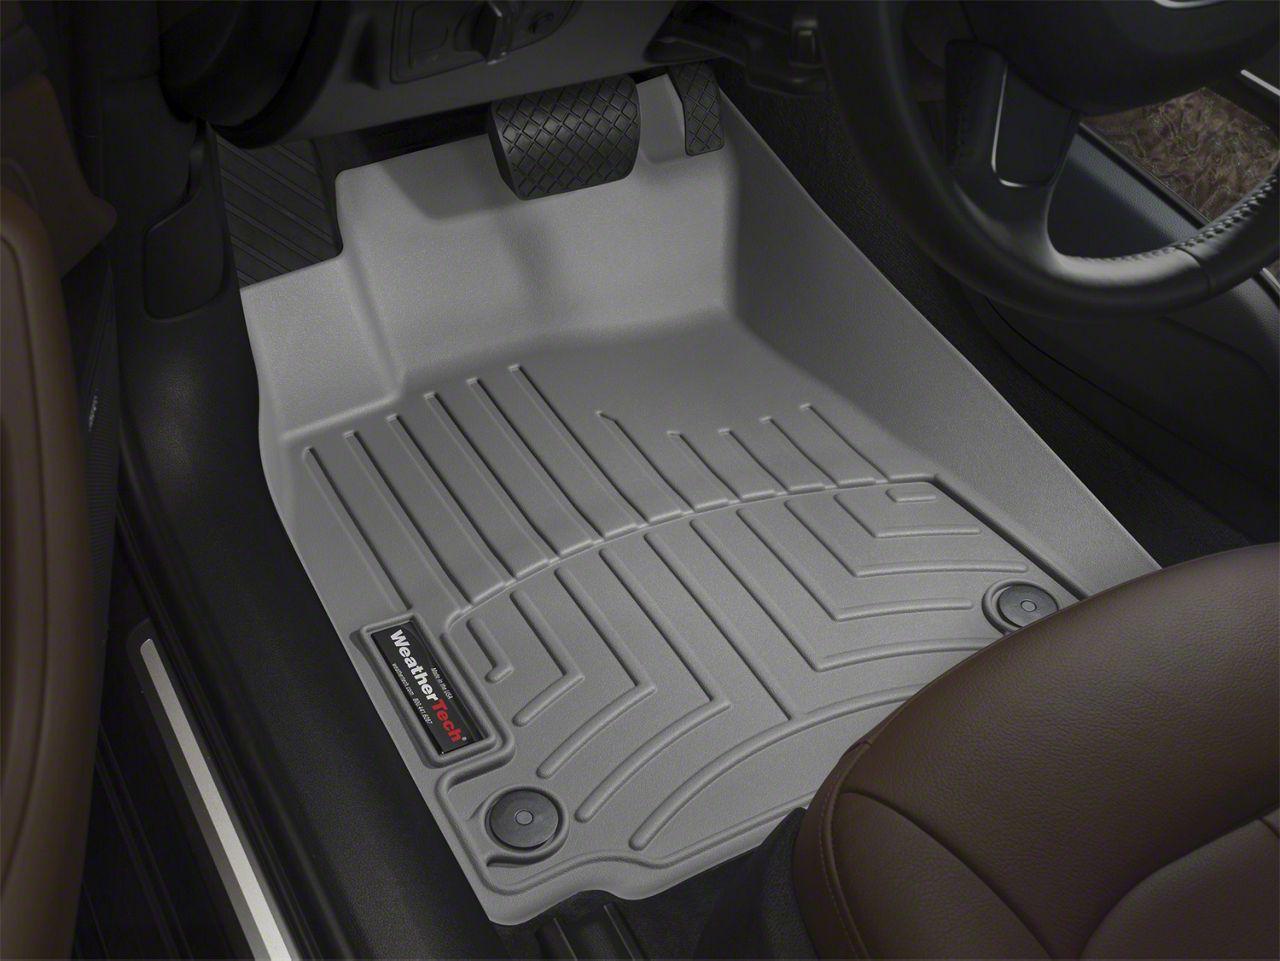 Weathertech DigitalFit Front Floor Liners - Gray (12-15 Tacoma Regular Cab, Access Cab)